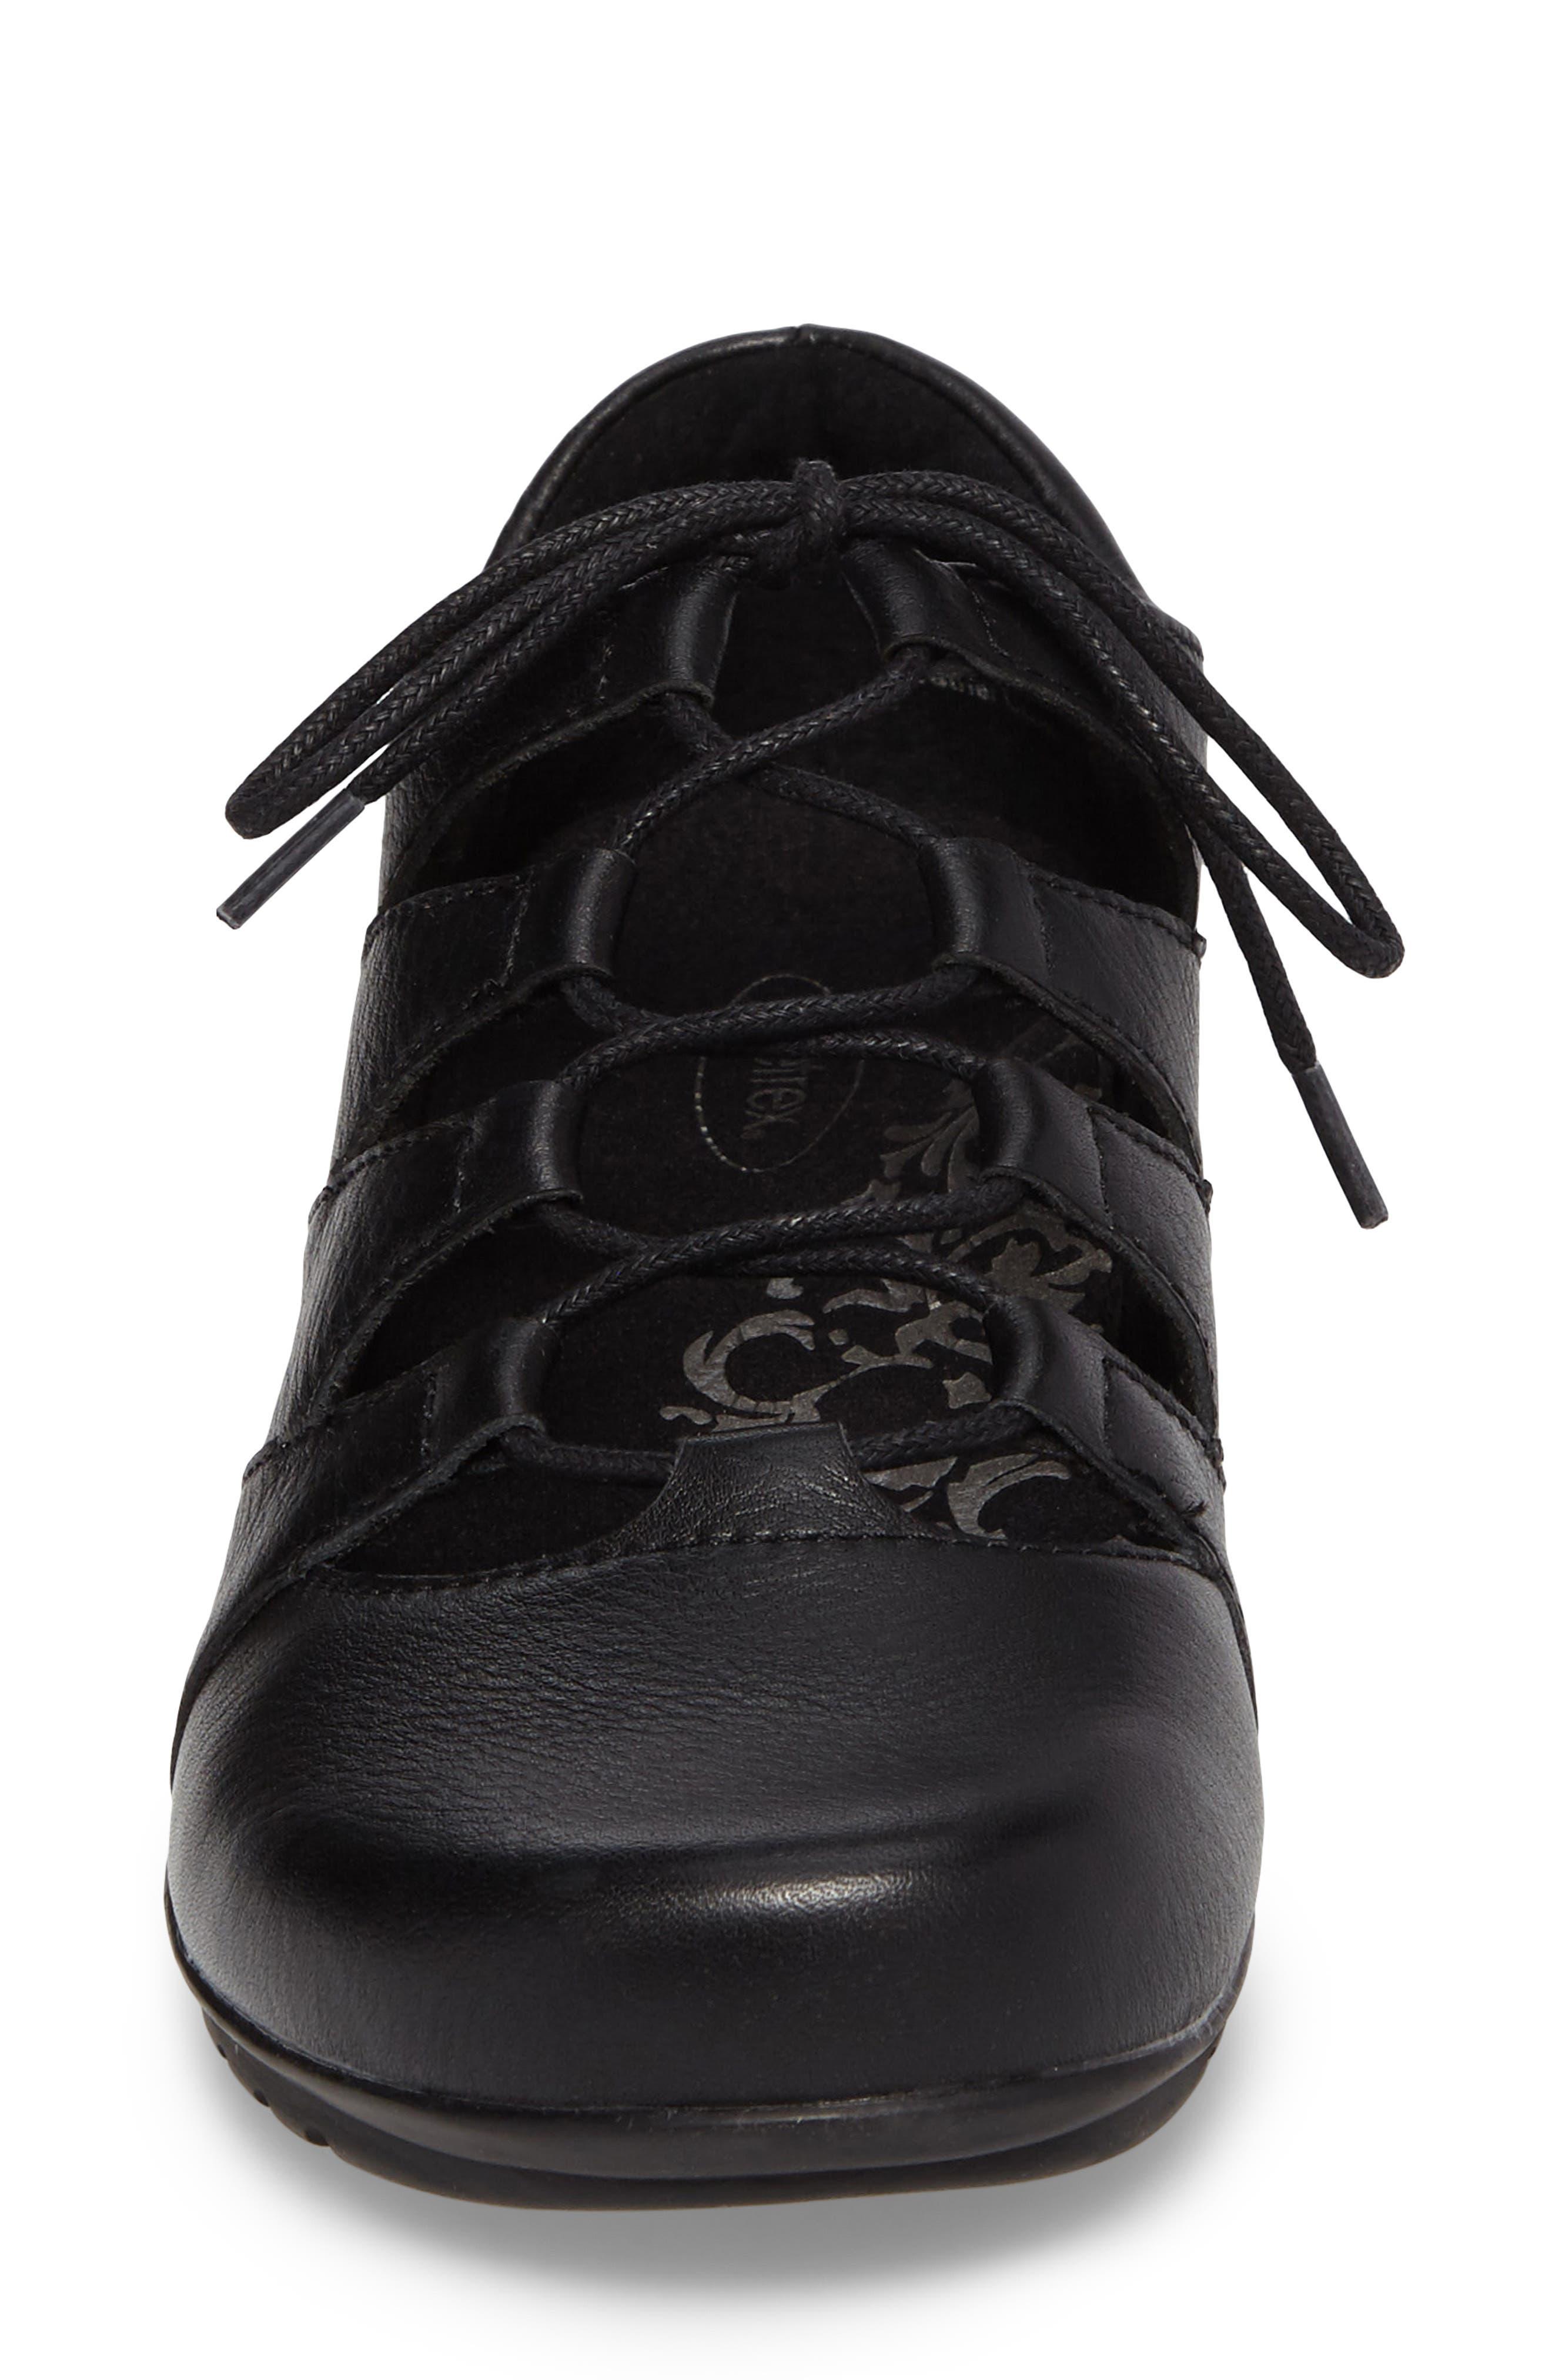 AETREX, Sienna Cutout Sneaker, Alternate thumbnail 4, color, BLACK LEATHER/ BLACK